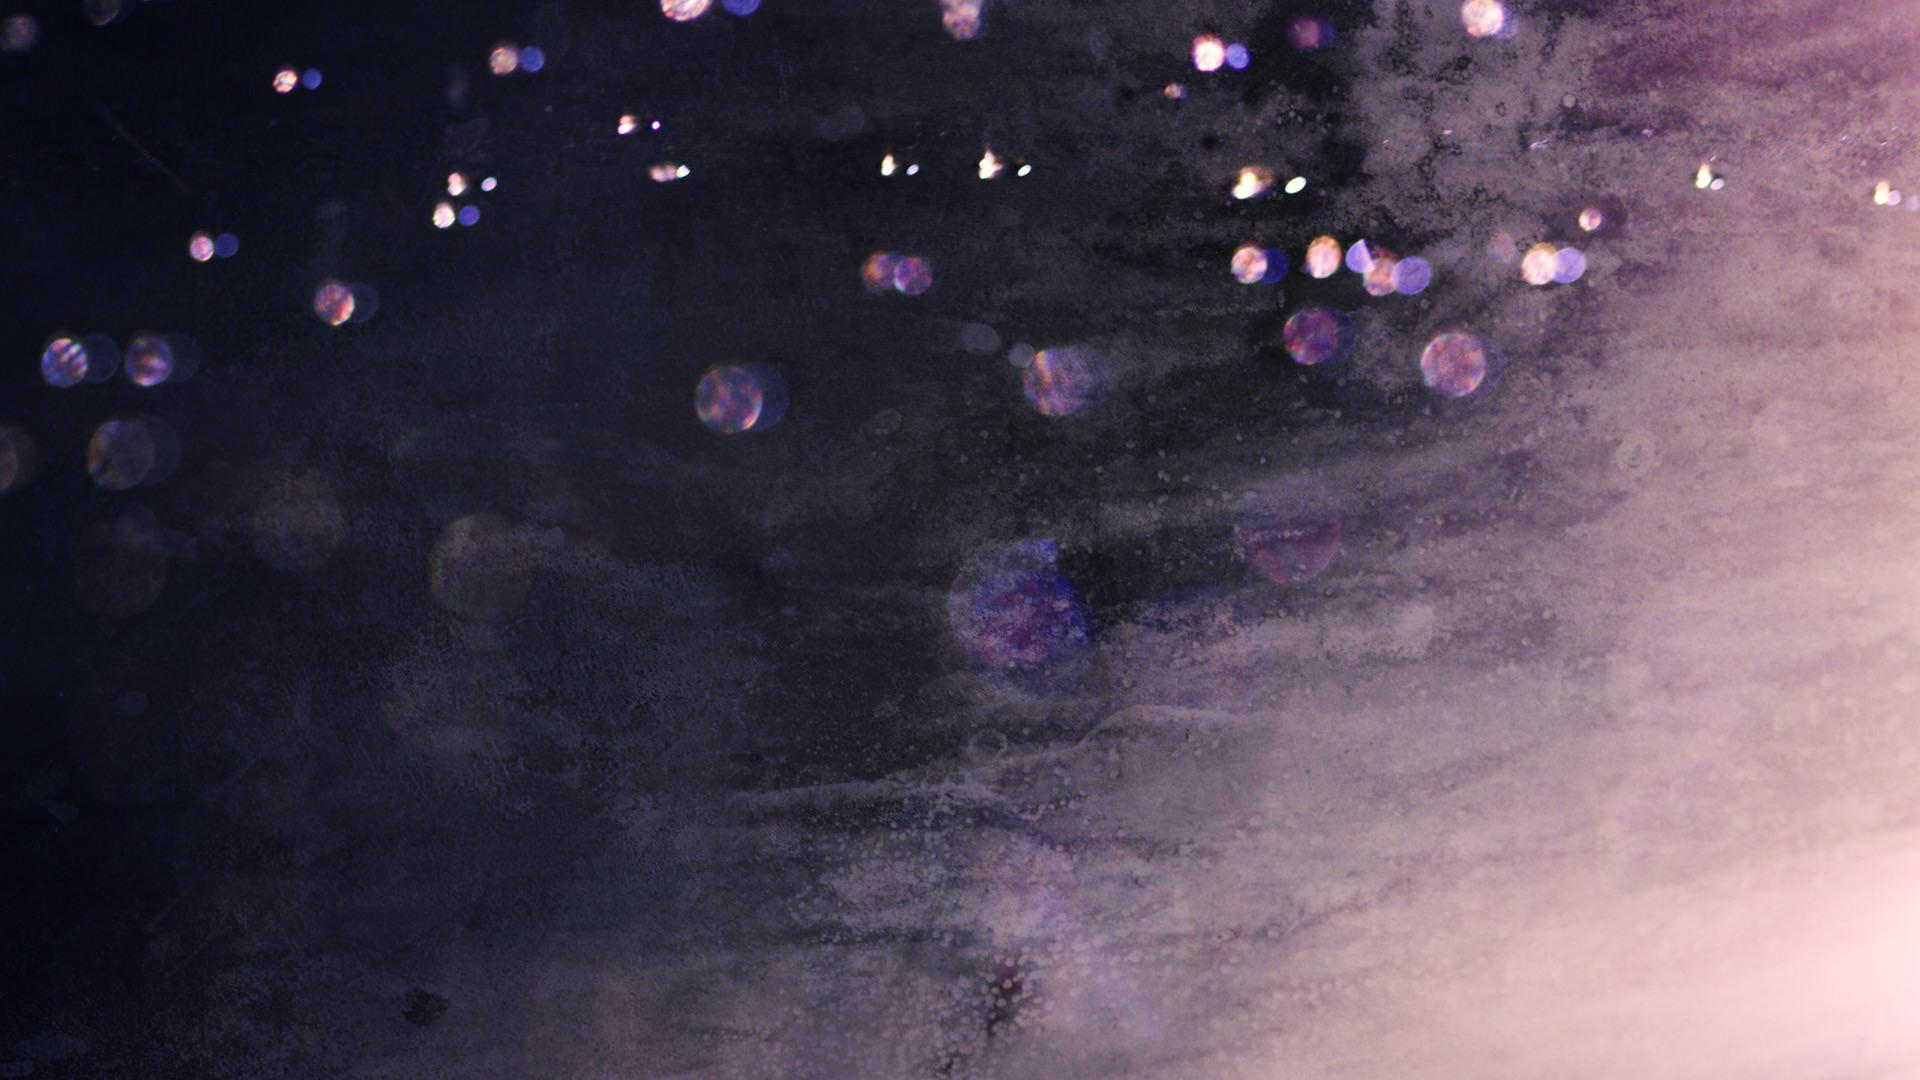 Cool Water Drops Purple Black Wallpaper Sc Desktop